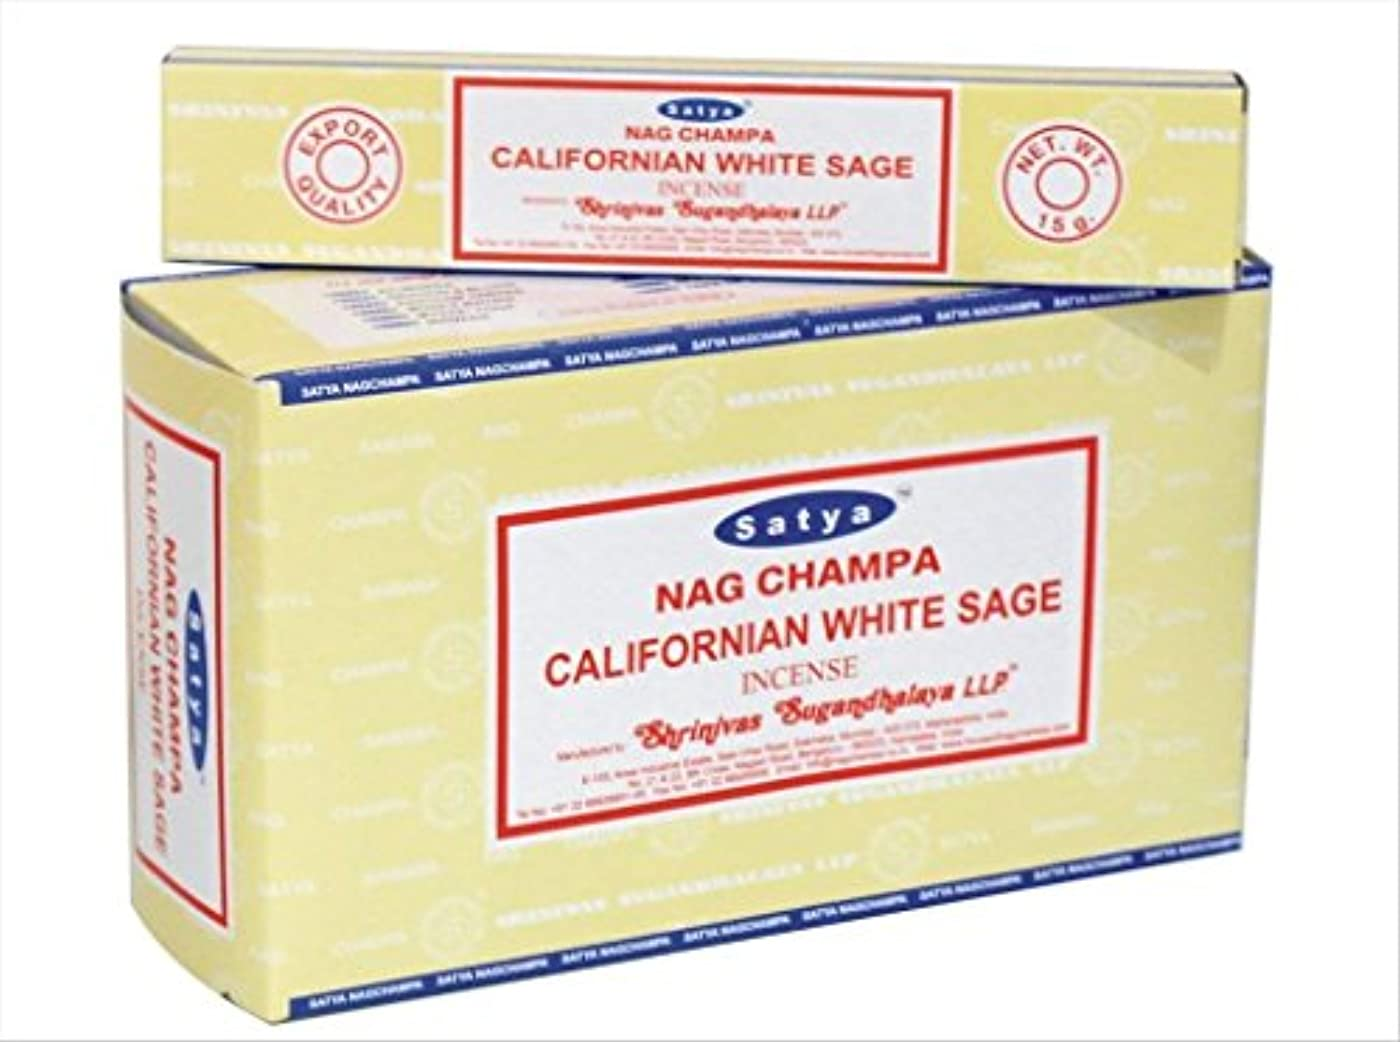 chi-city Mall Satya Nag Champa Californianホワイトセージお香|署名Fragrance | Net Wt : 15 g x 12ボックス= 180 g | Exclusivelyインド...